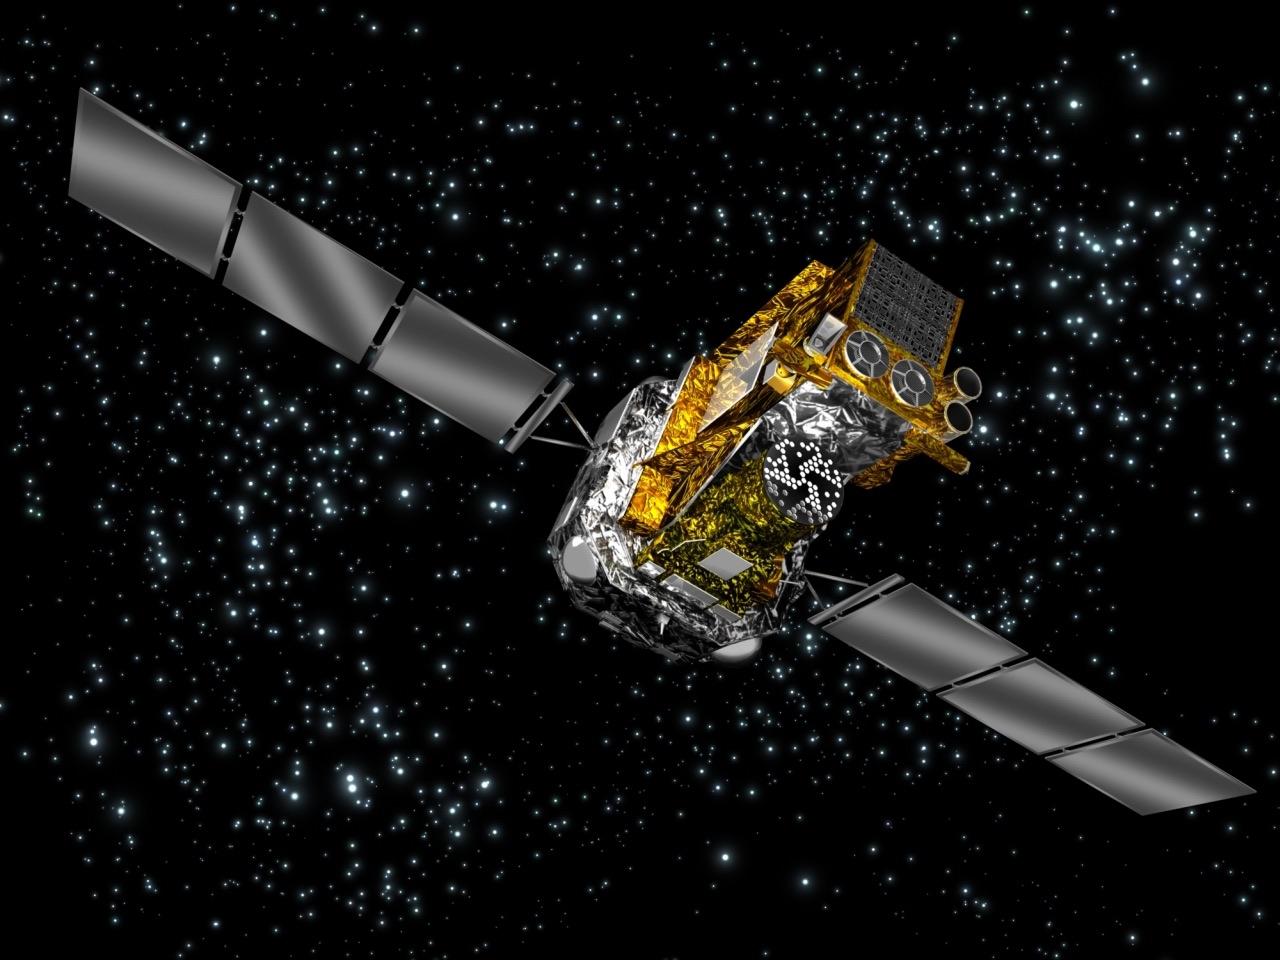 Satélite Integral- ESA, D. Ducros